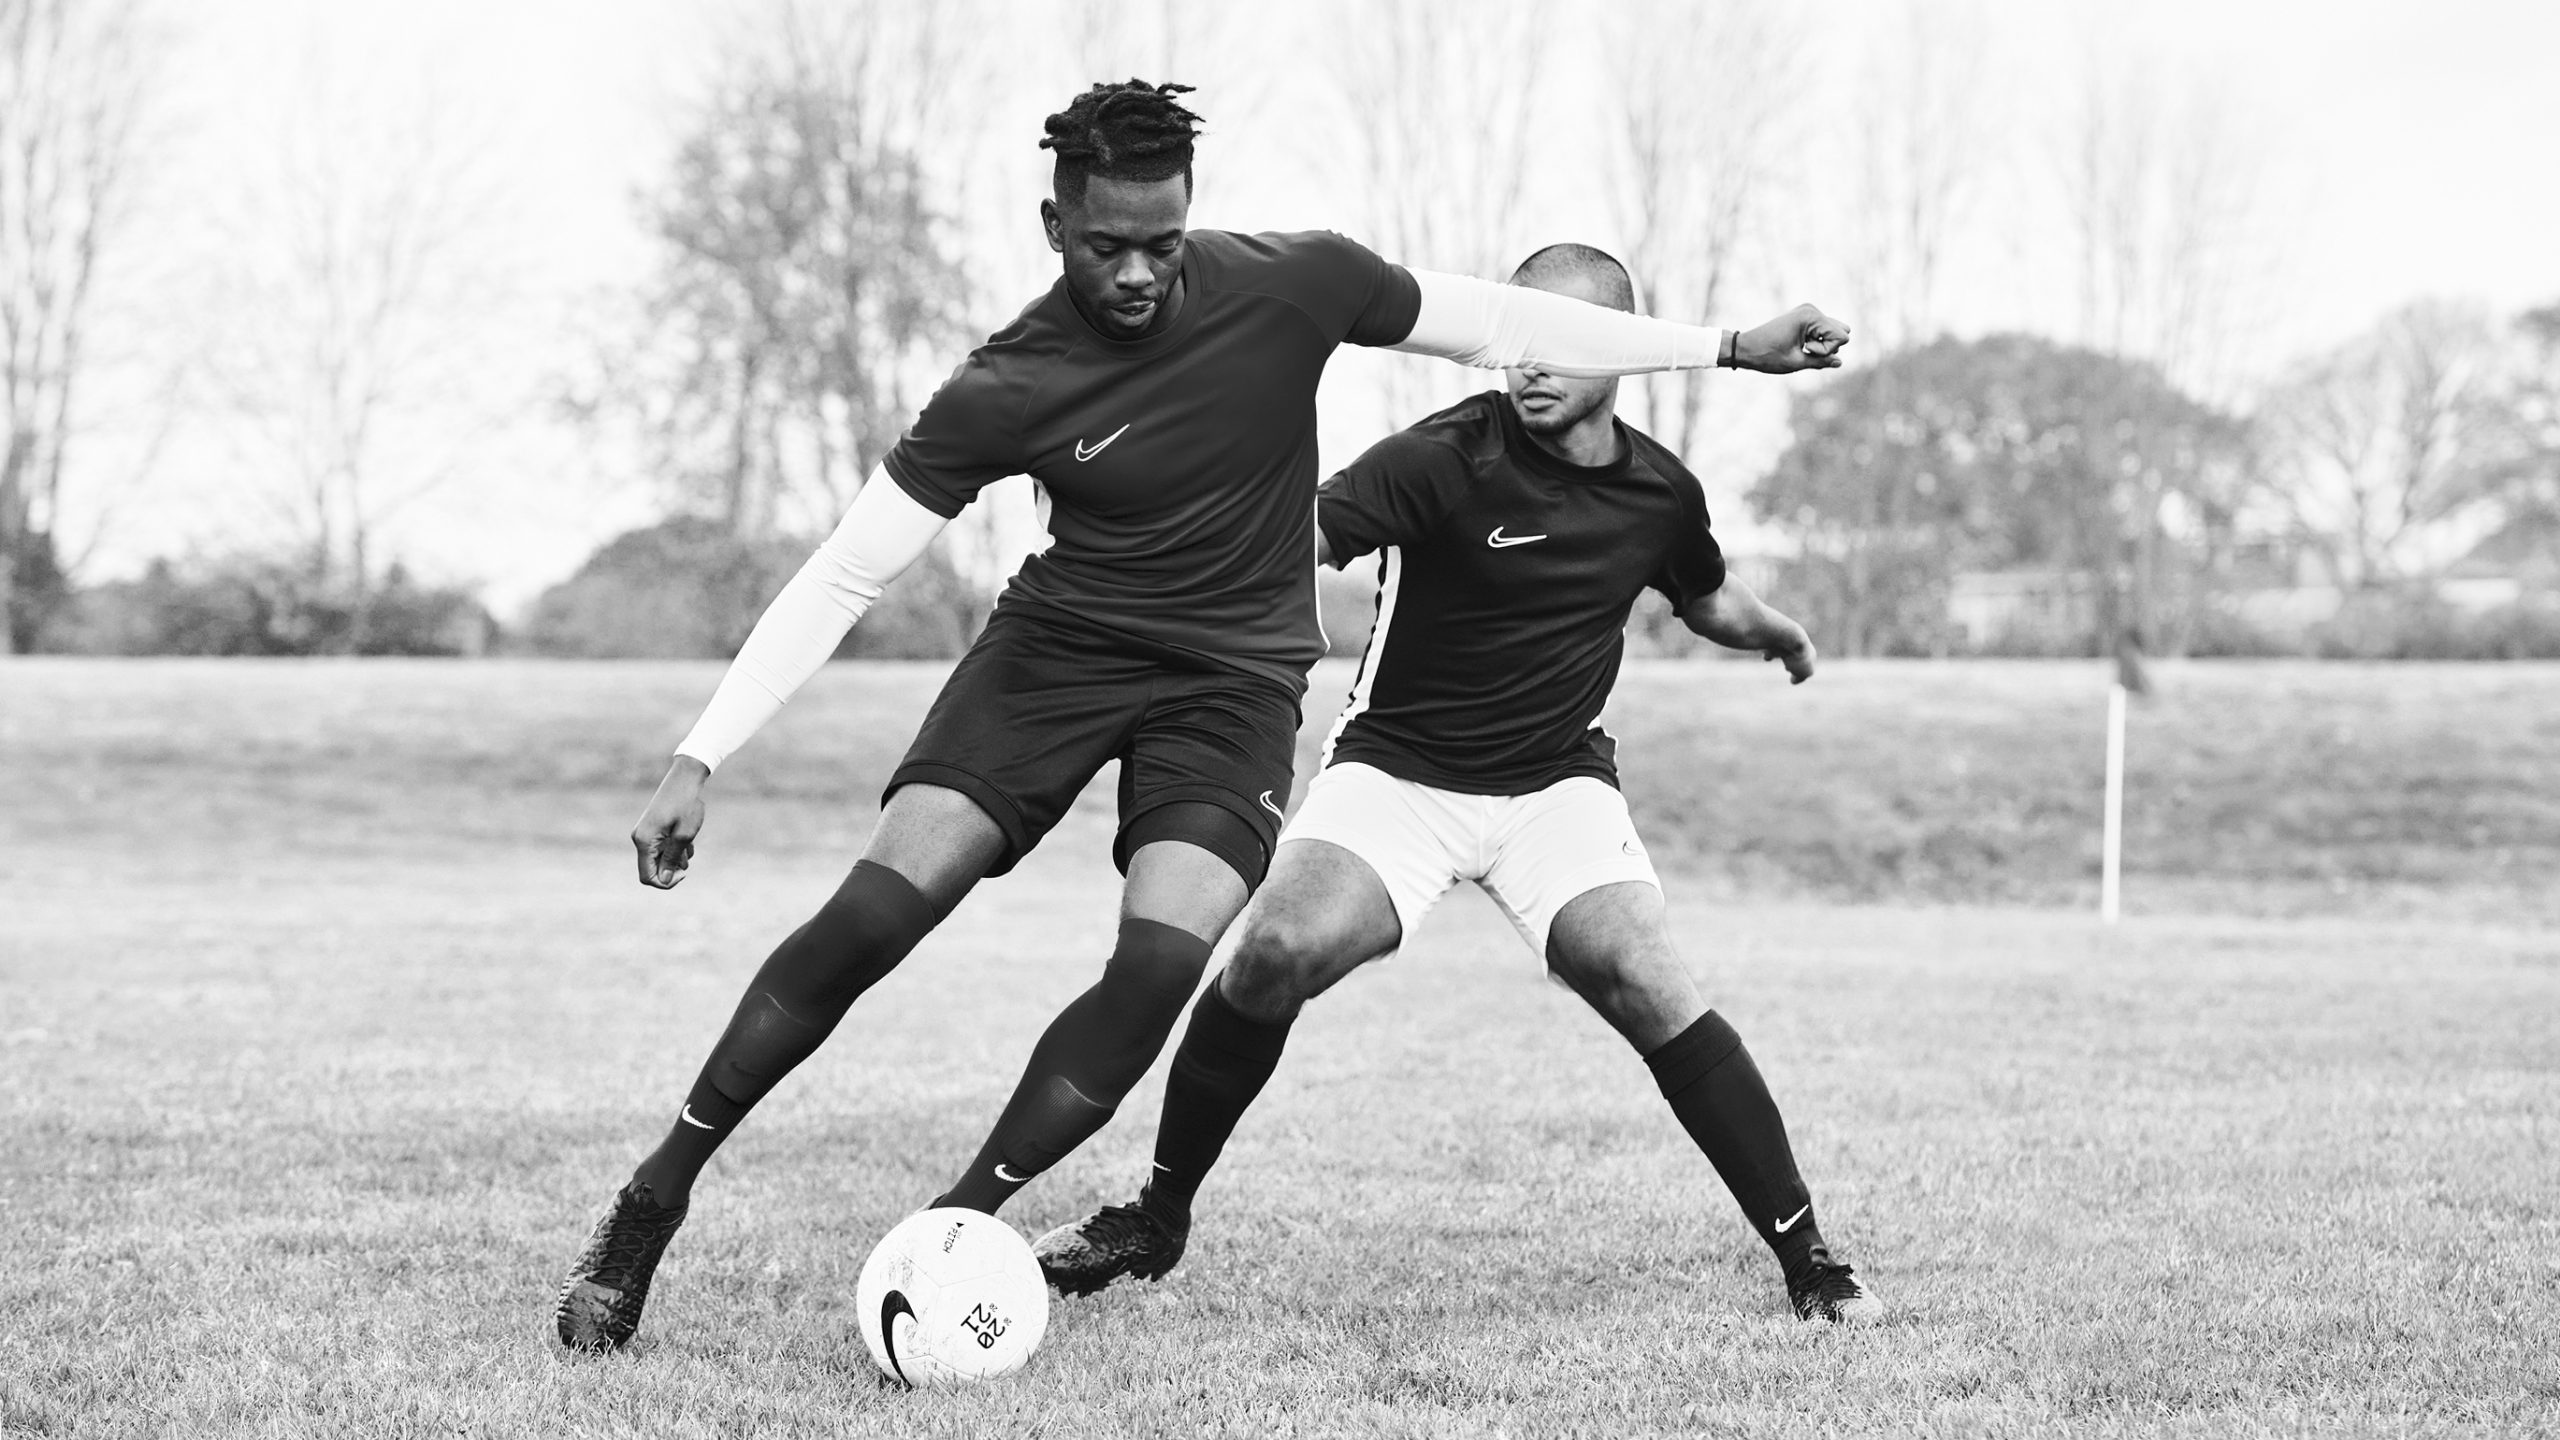 SD_Venture3_Day_1_Sunday-League-Football_0263-16×9-version